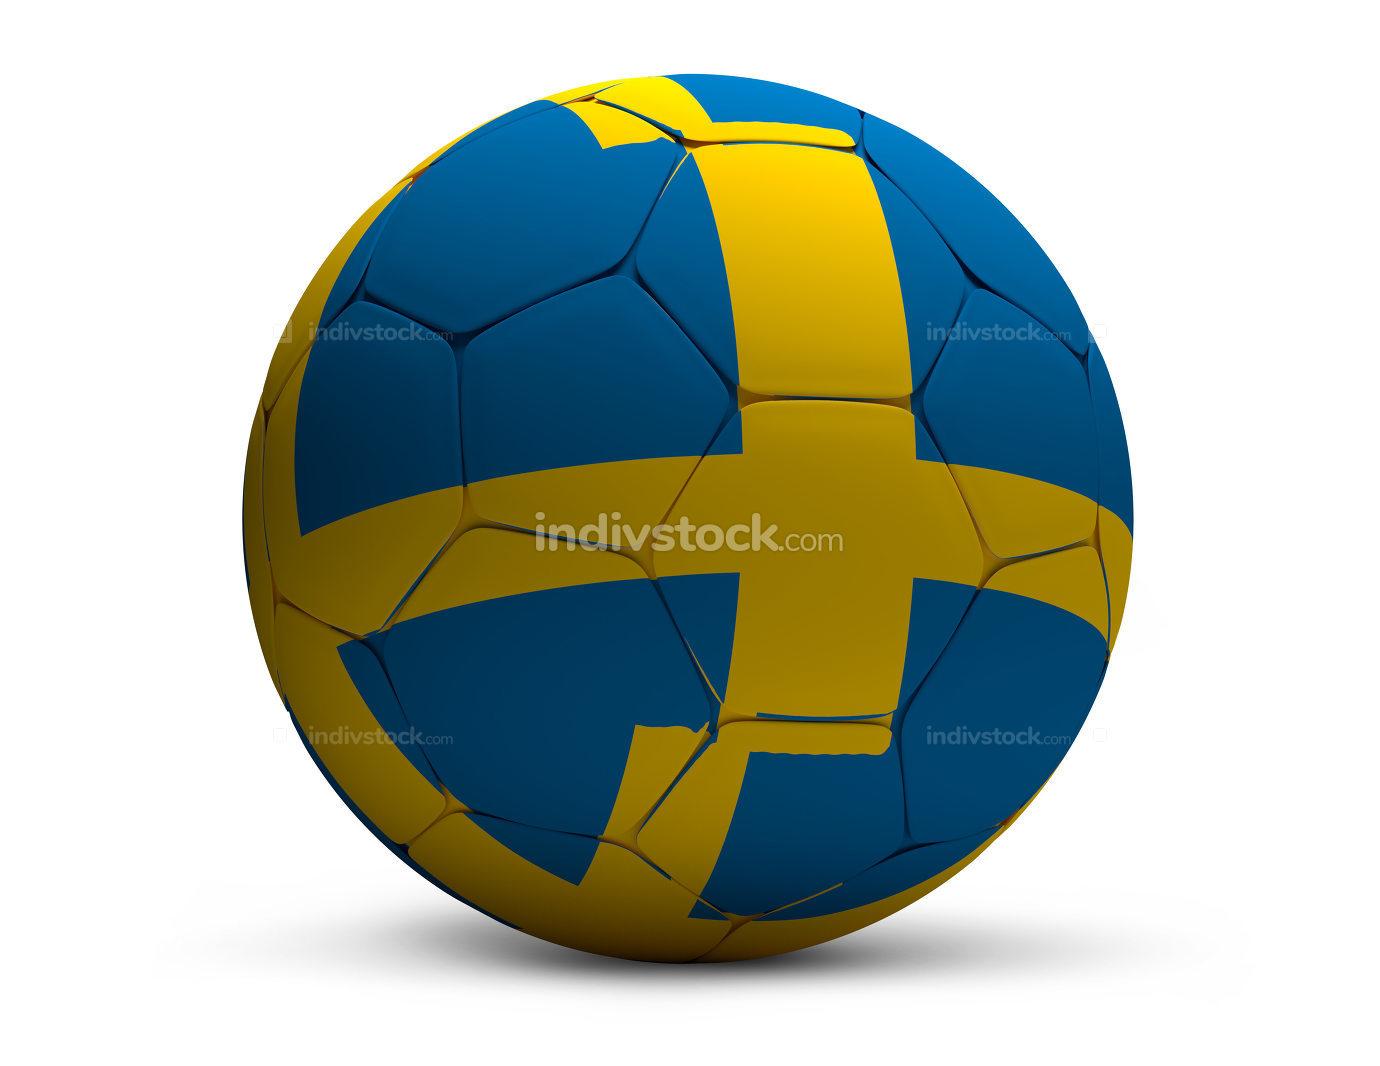 Sweden swedish soccer football ball 3d rendering isolated